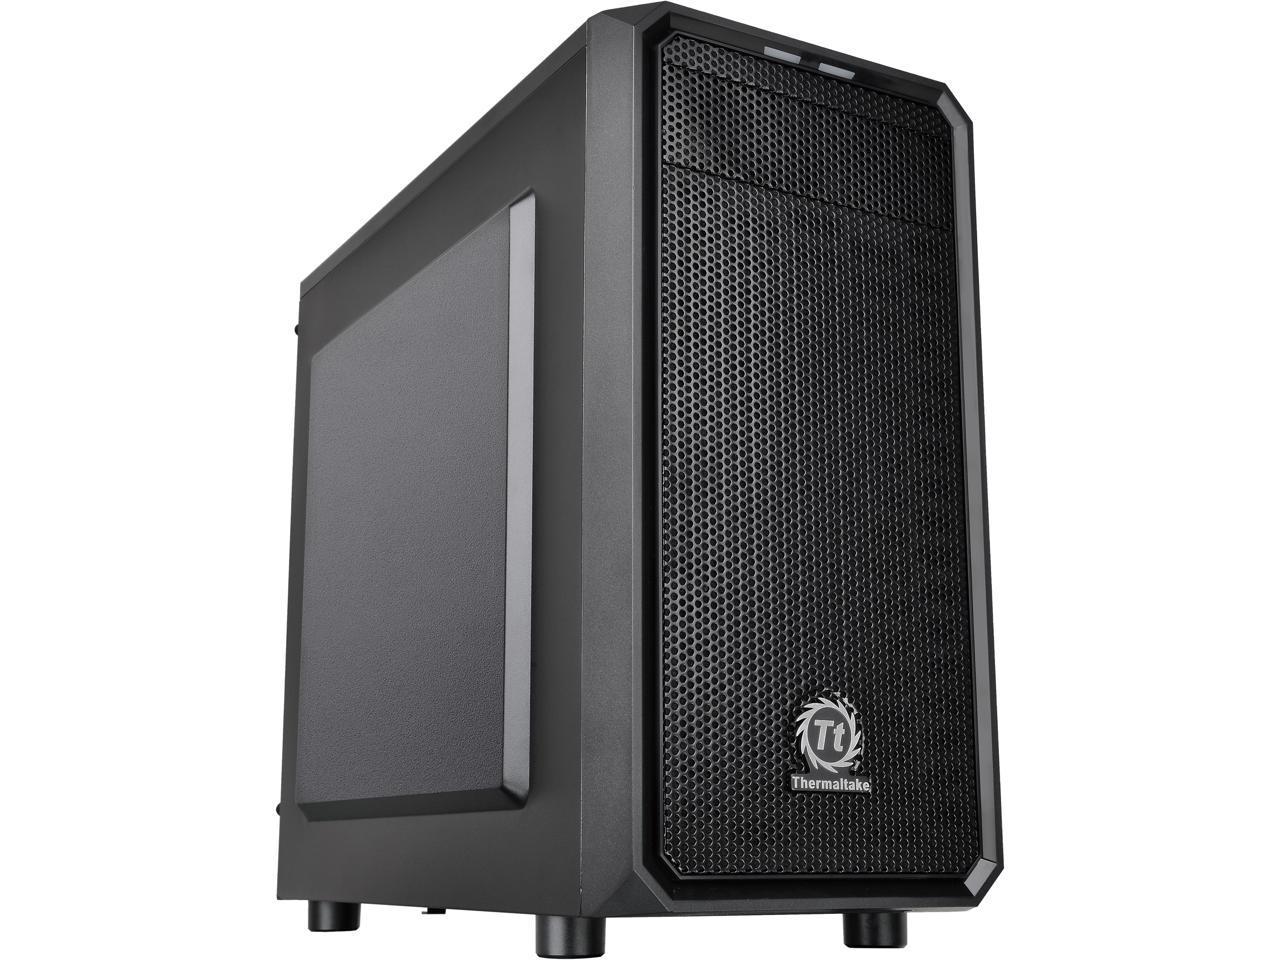 Thermaltake Versa H15 SPCC Micro ATX Tower Computer Case (Black)